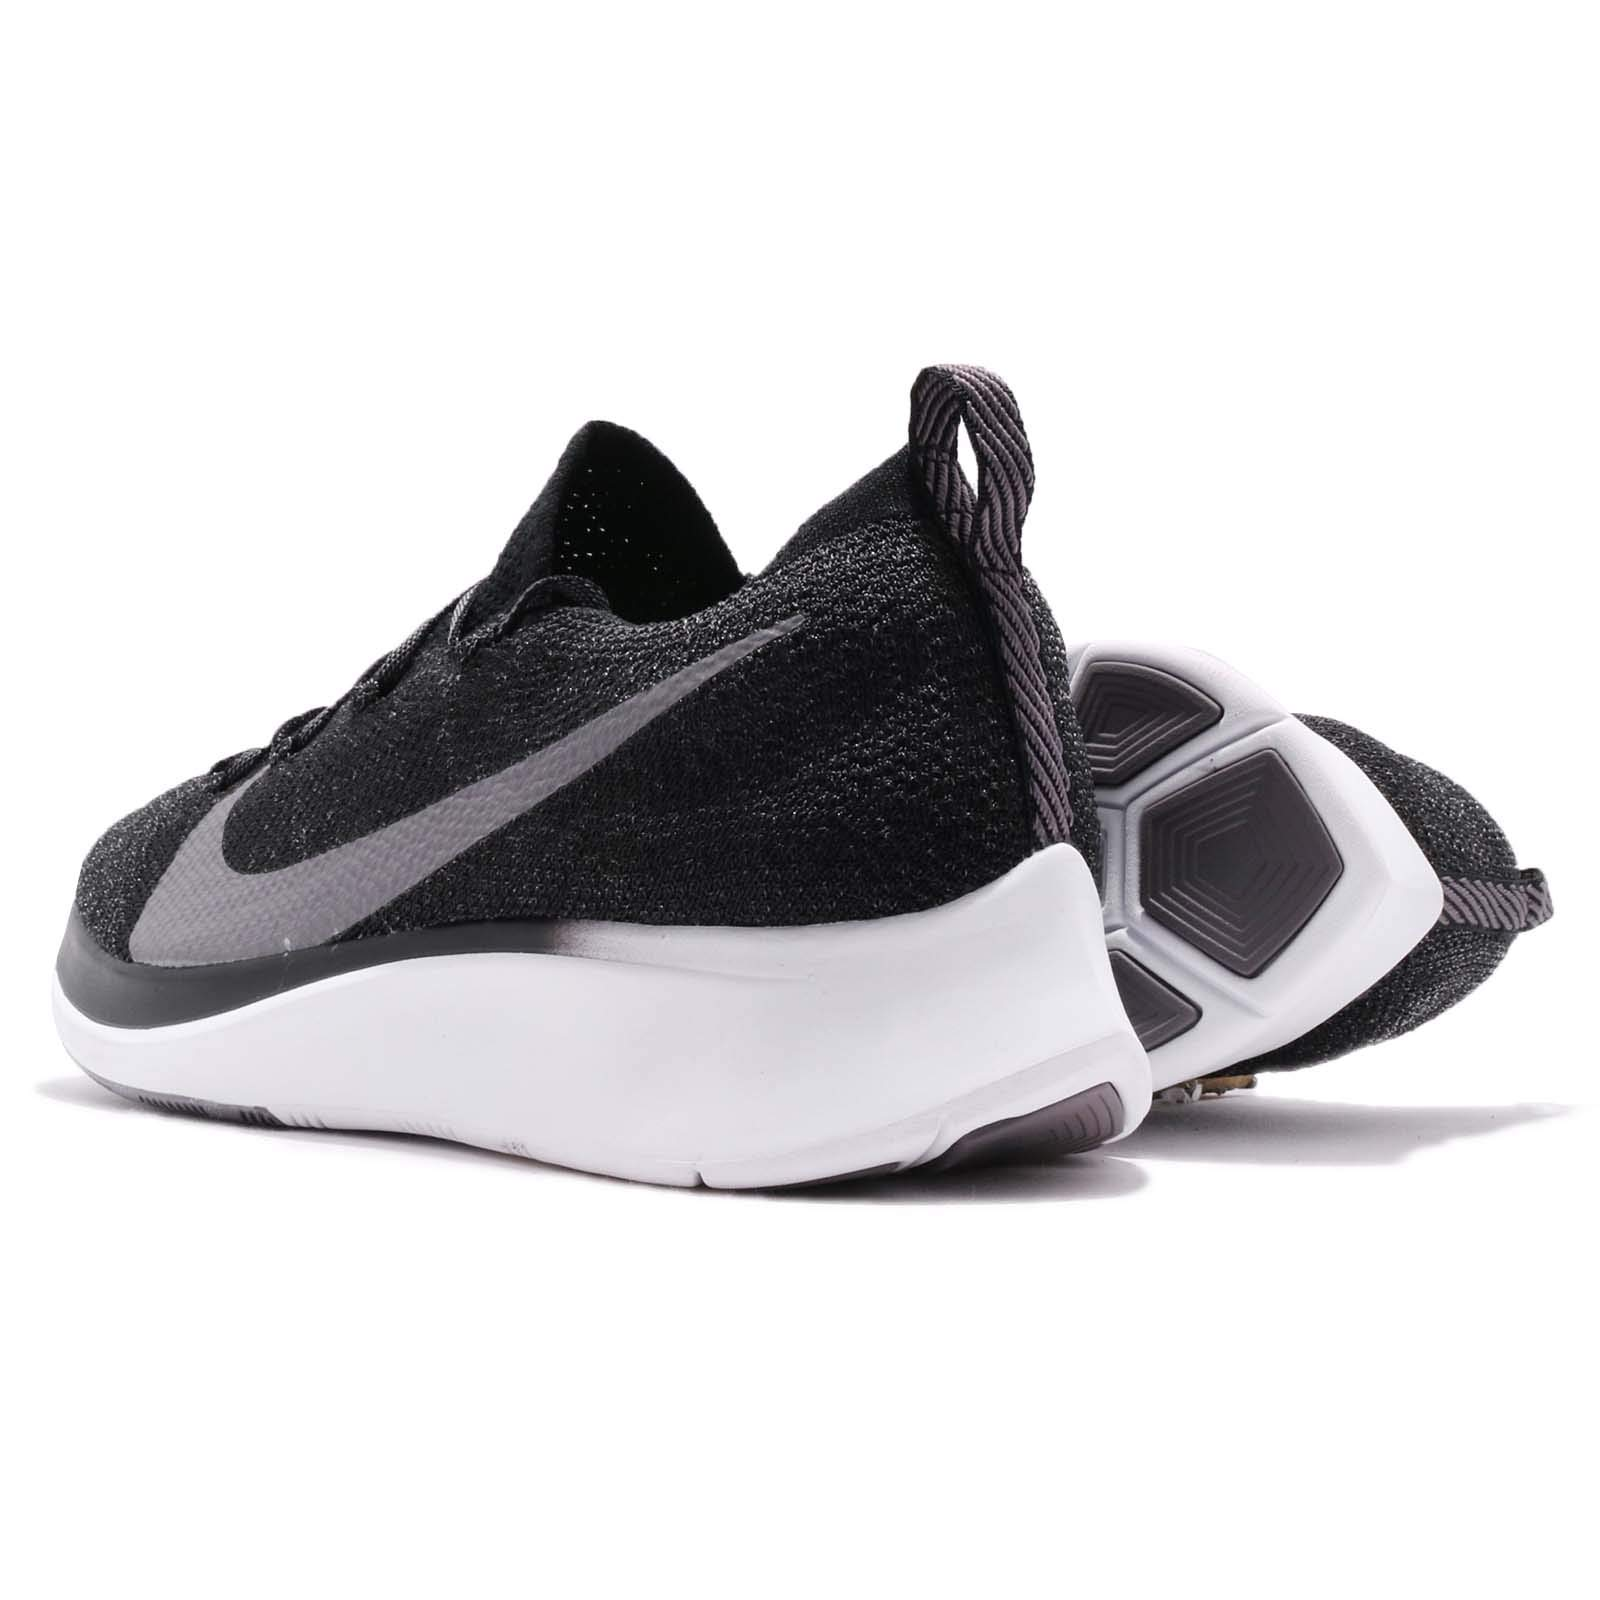 Nike Zoom Fly Flyknit Men's Running Shoe Black/Gunsmoke-White Size 7.5 by Nike (Image #6)